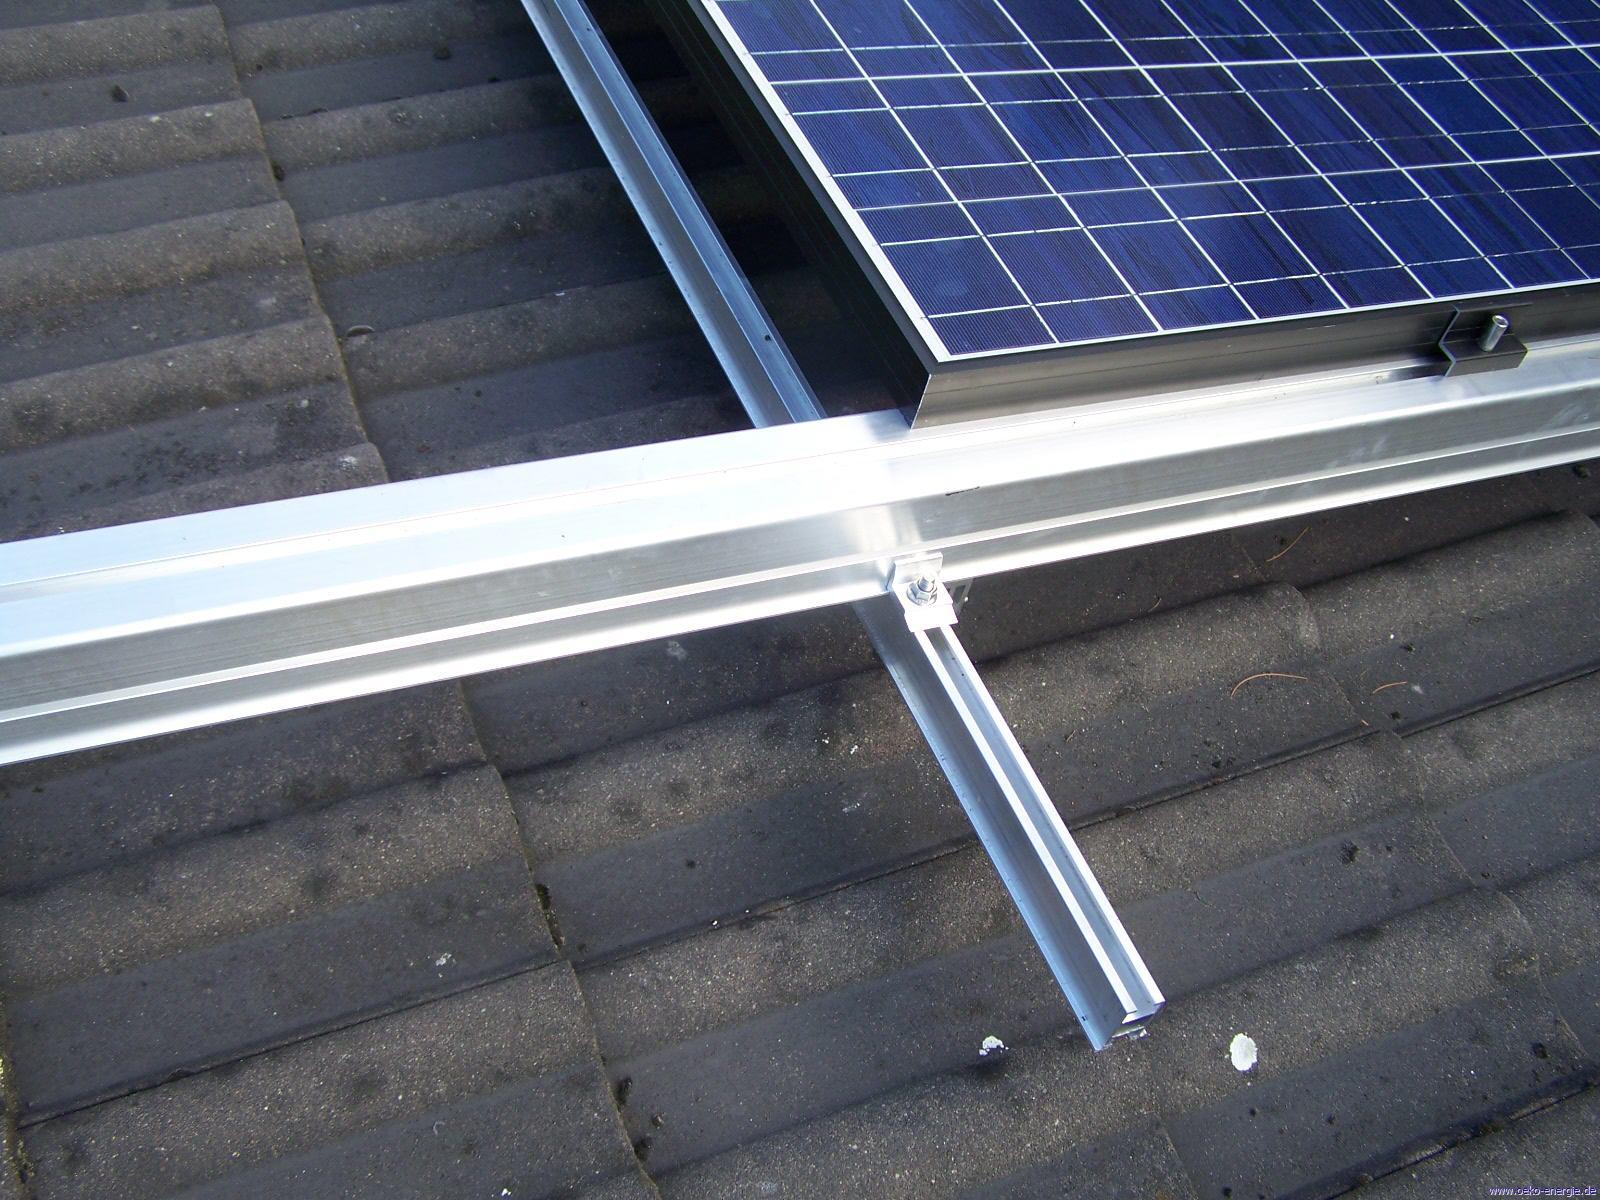 5 Stück Special Buy Solaranlage Befestigung Solarmodul Halter Träger Photovoltaik-zubehör